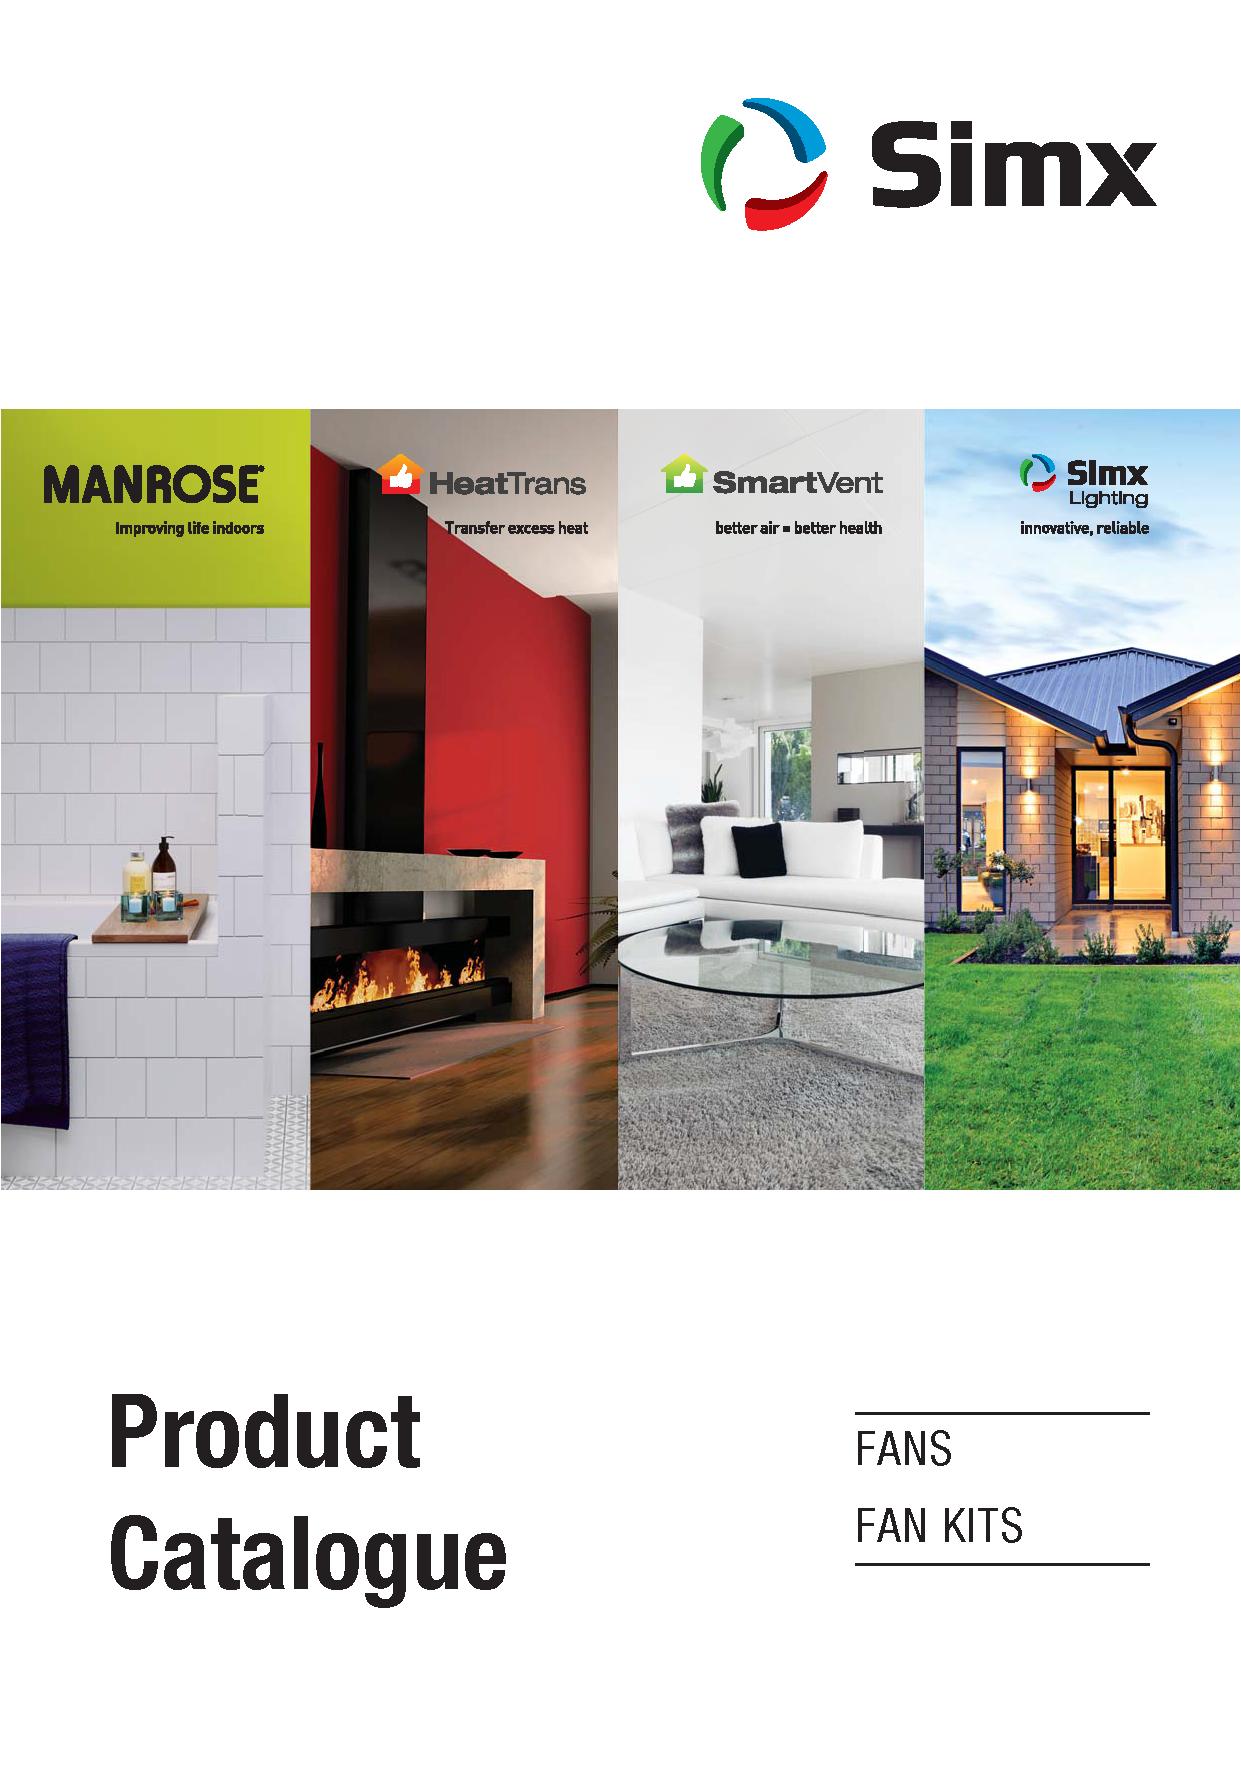 Fans and Fan Kits Catalogue